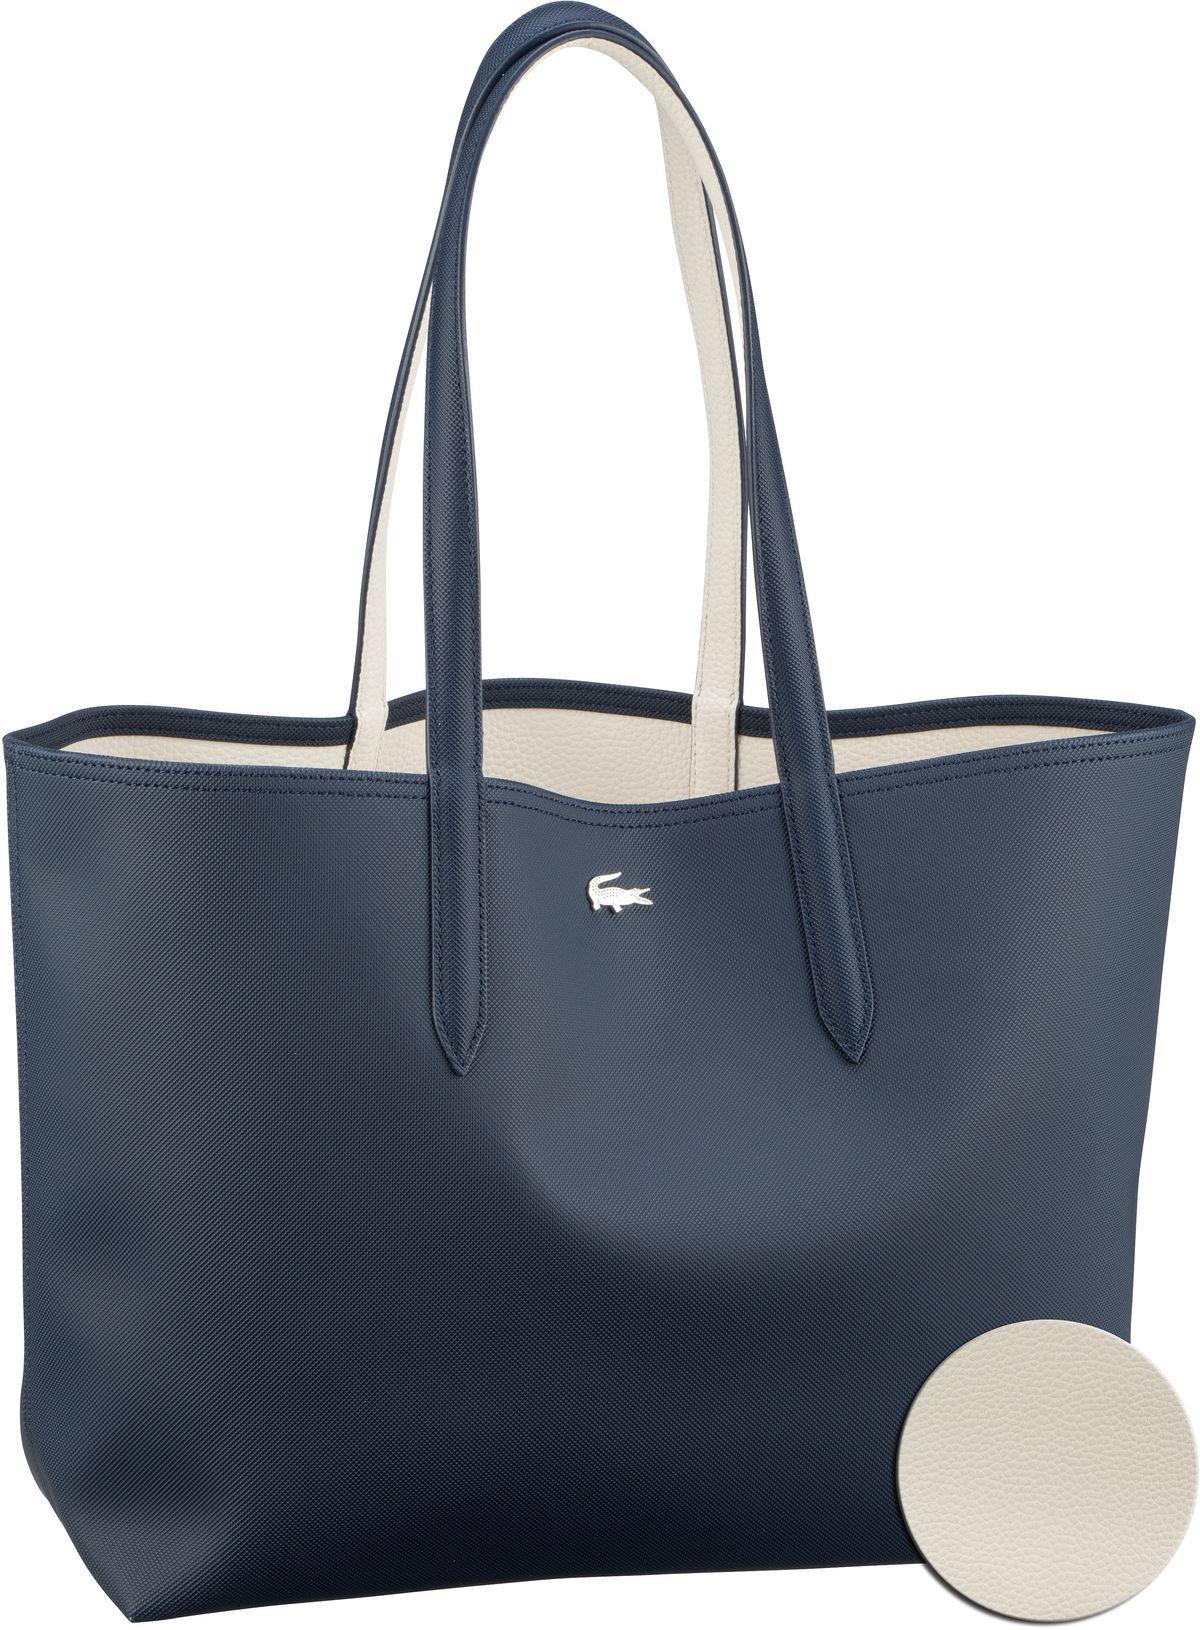 Shopper Anna Shopping Bag 2142 Dark Sapphire/Marshmallow (innen: Weiß)